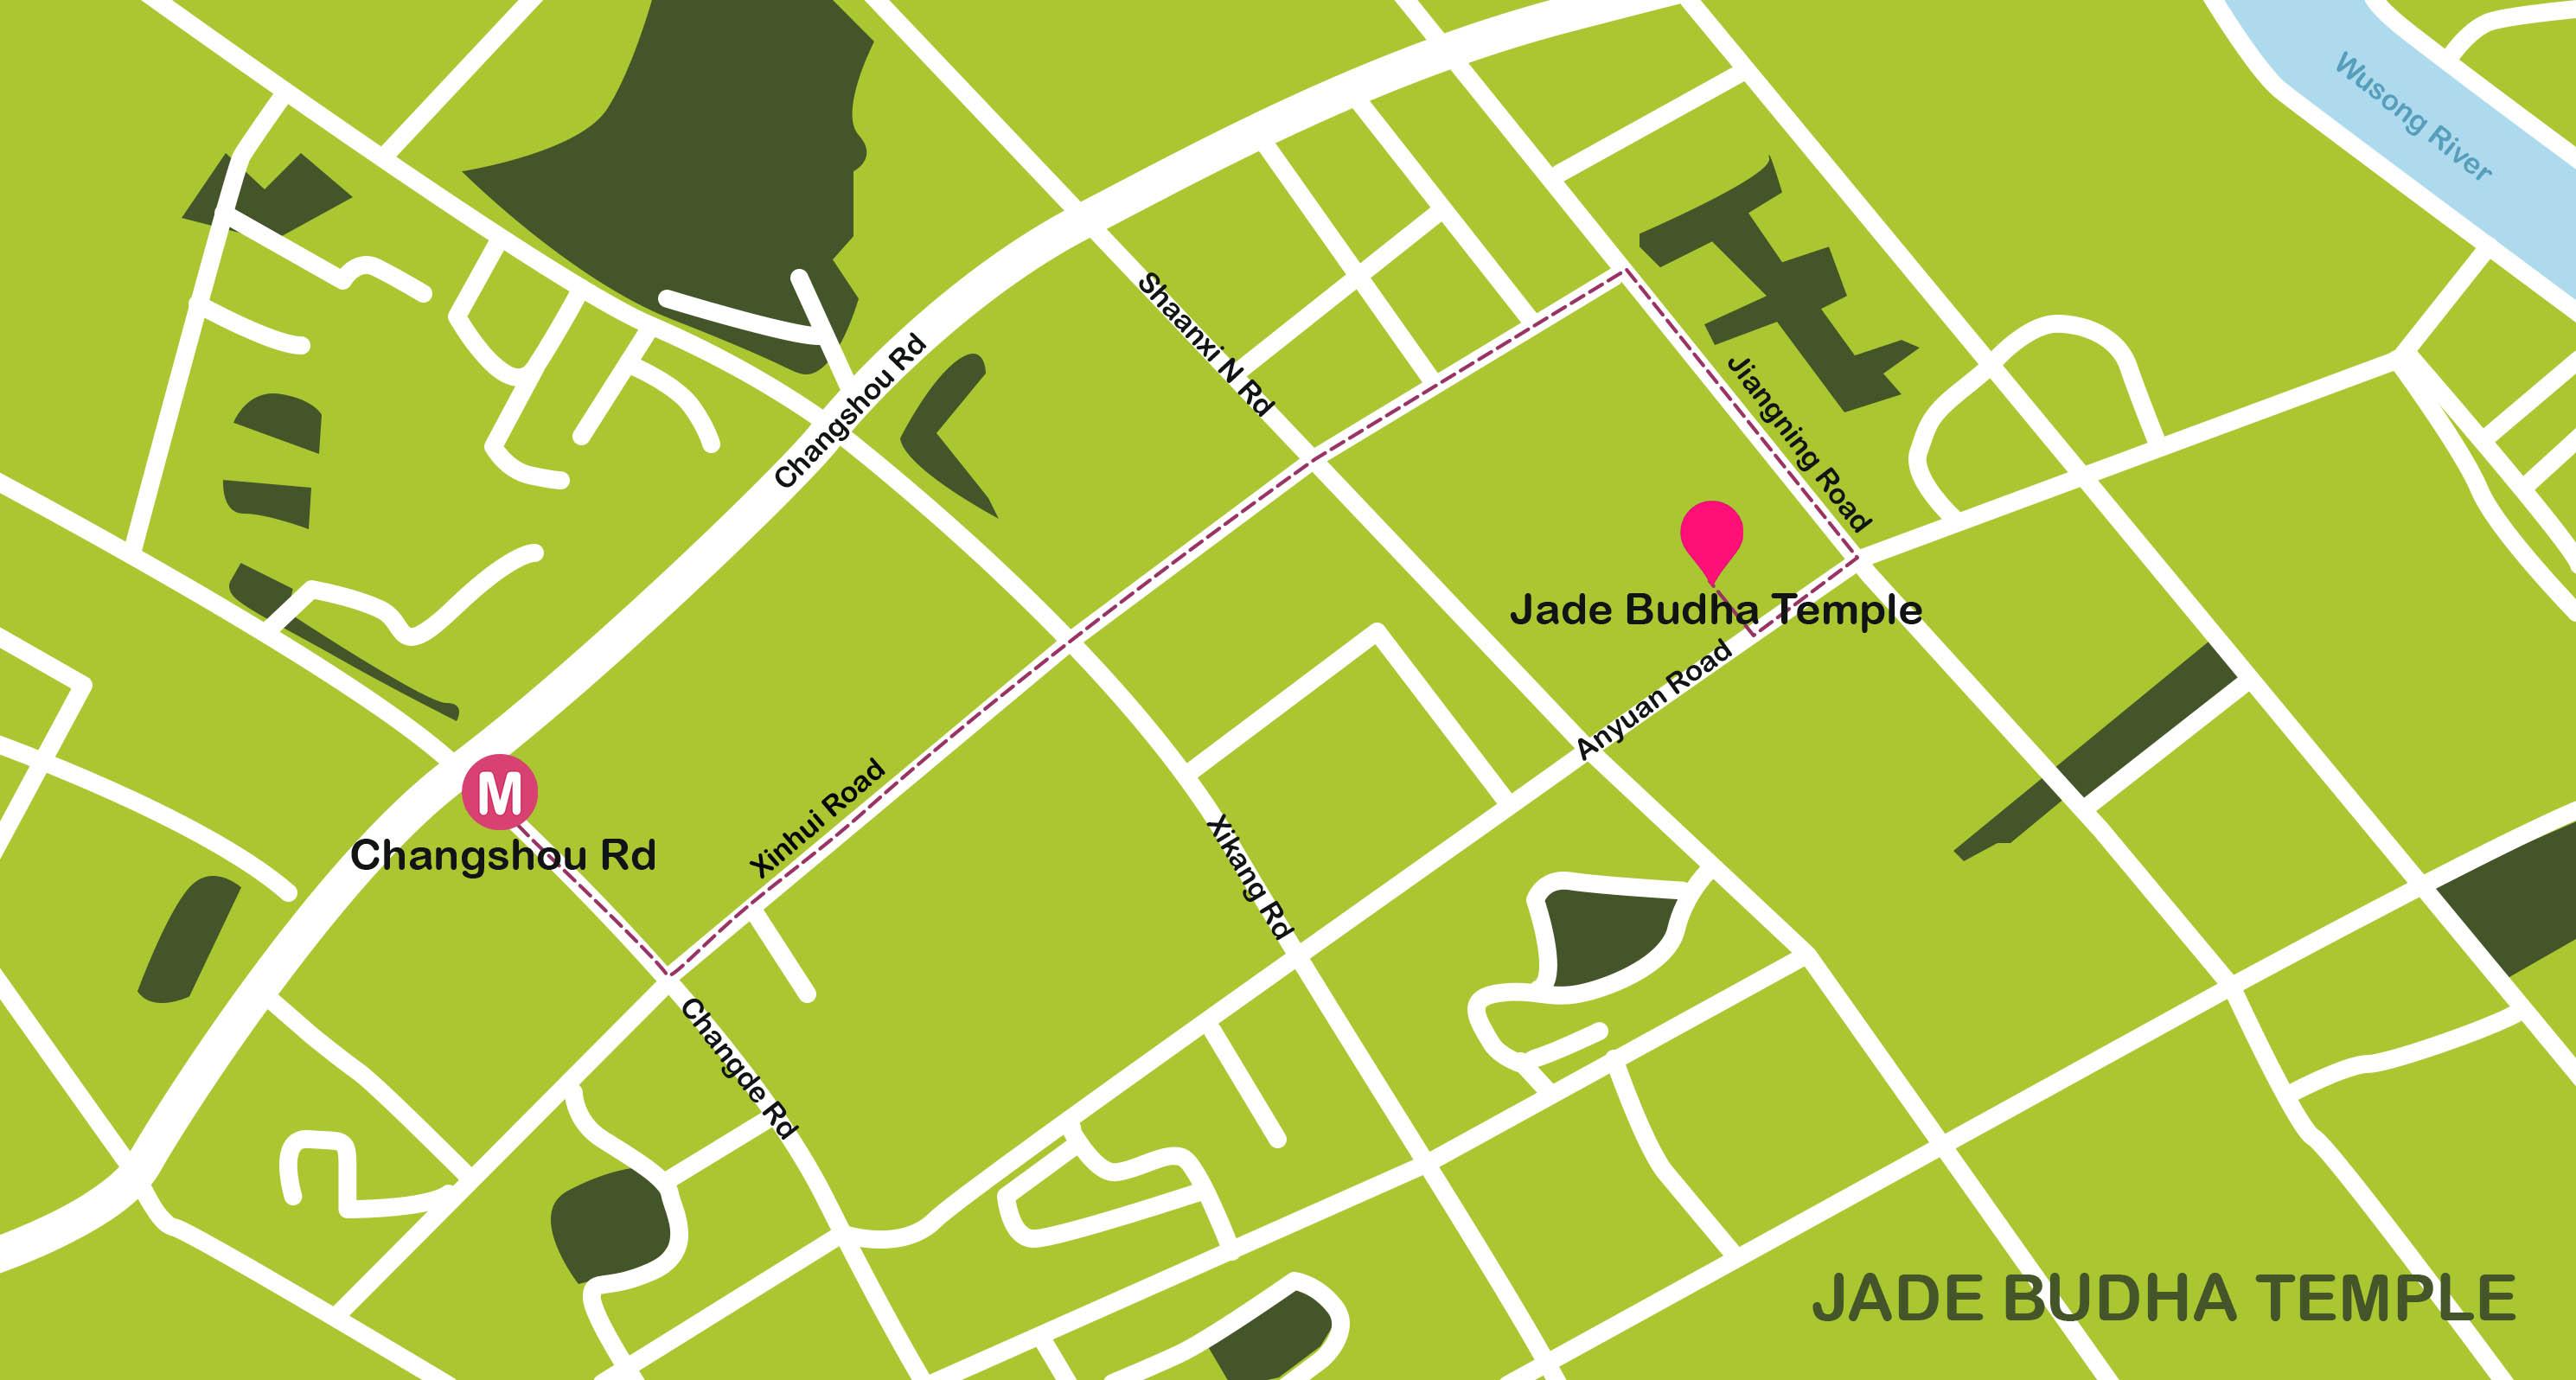 Mapa de Shanghai. Jade Budha Temple